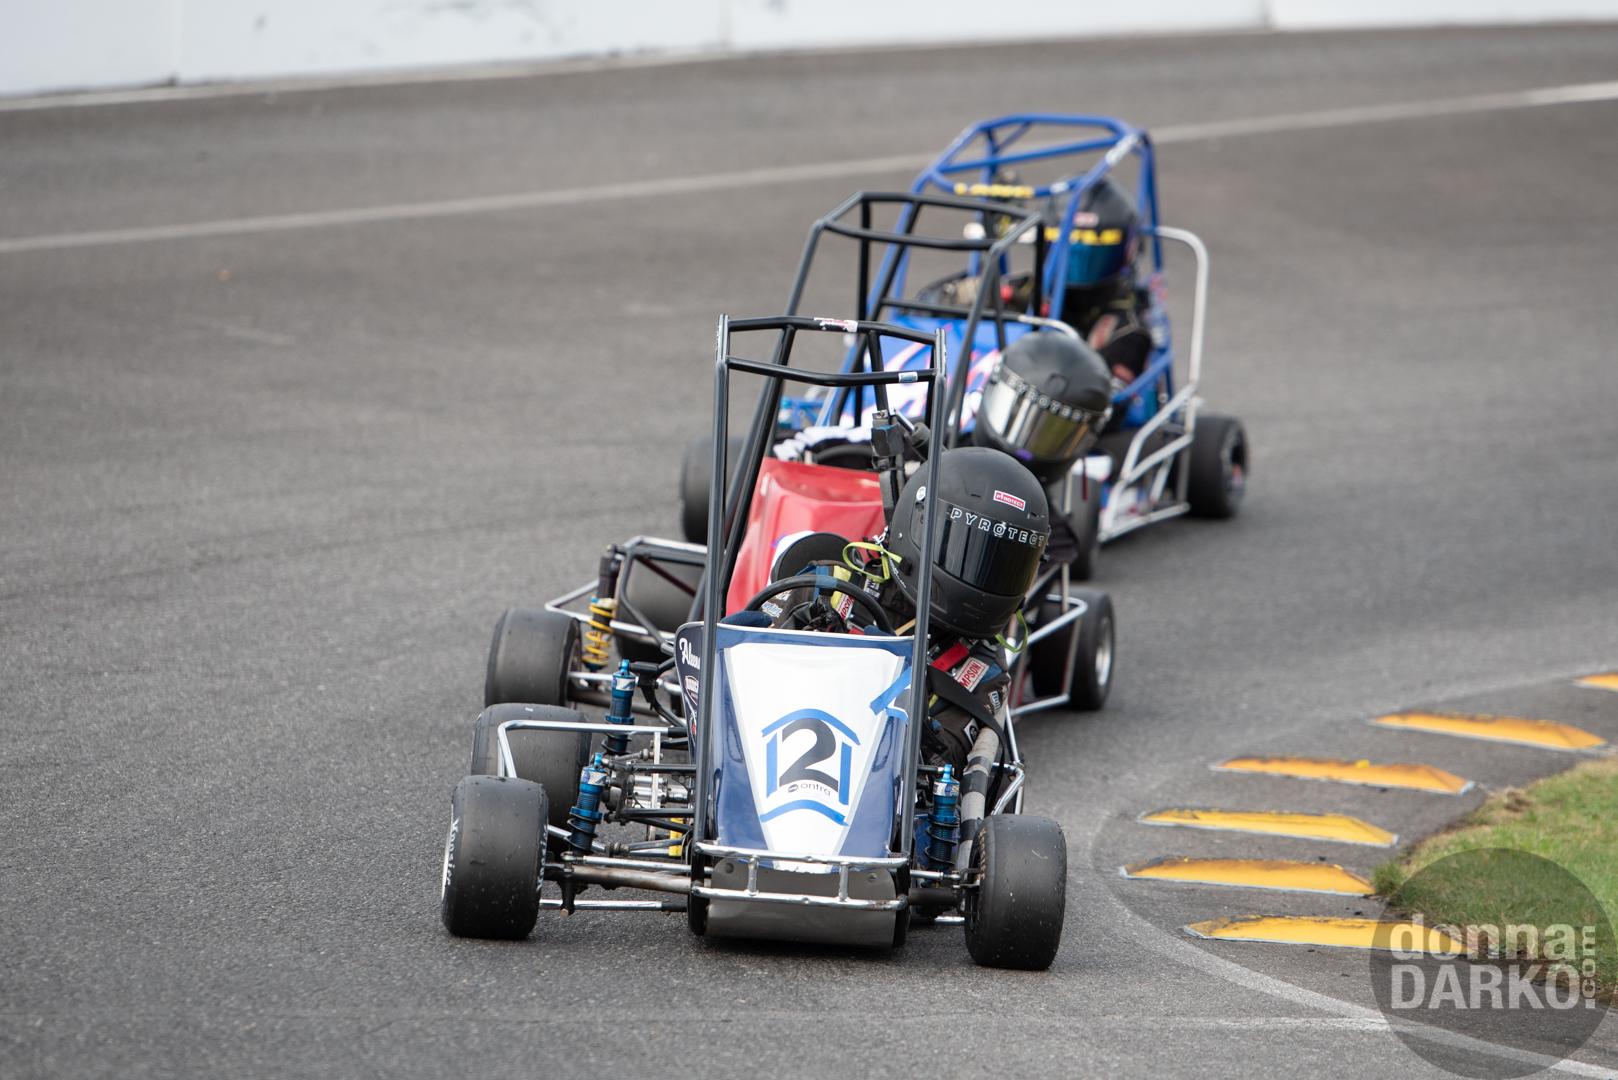 QWMA (Racing) 8-11-2019 DSC_7776.jpg